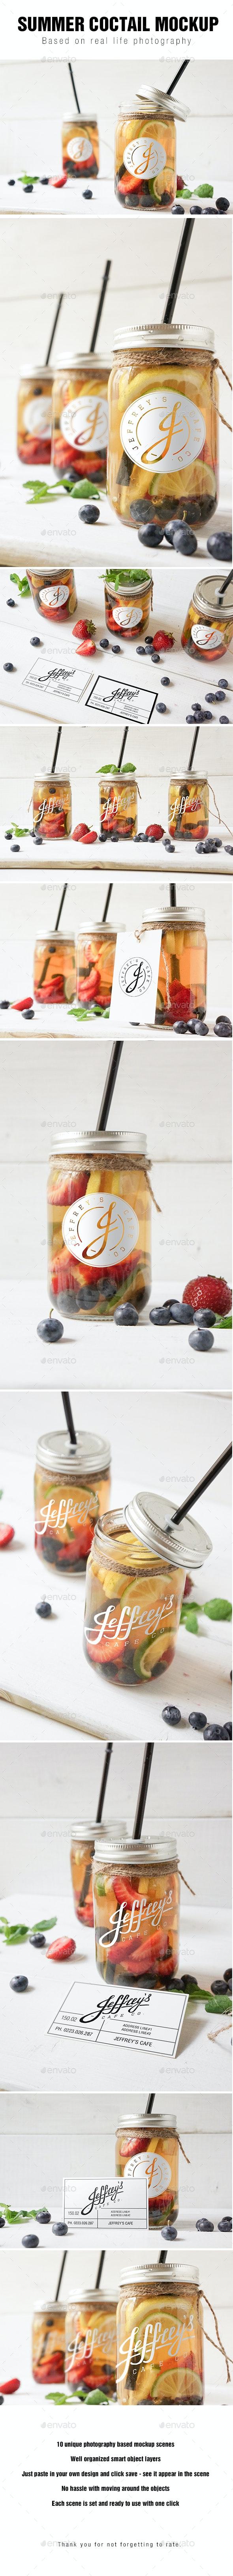 Mason jar Ice tea summer coctail mockup - Food and Drink Packaging